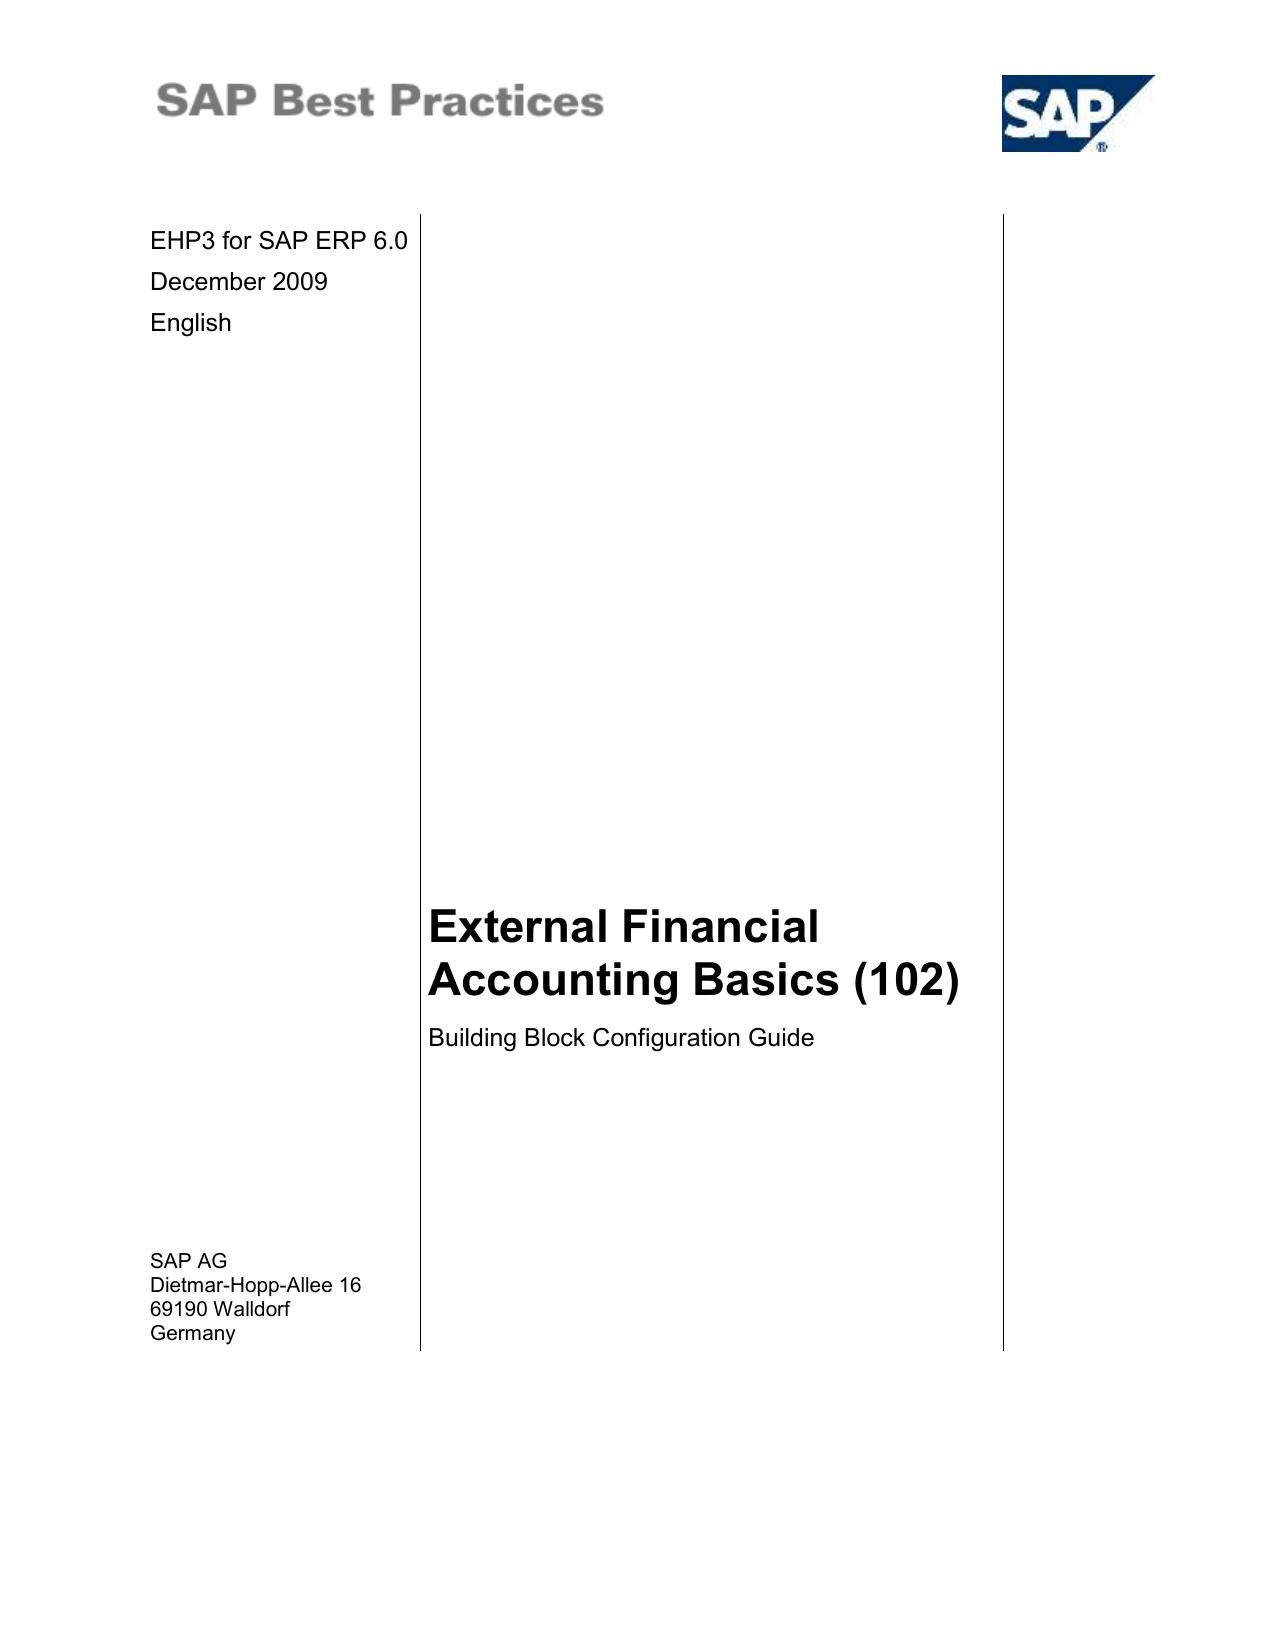 External Financial Accounting Basics